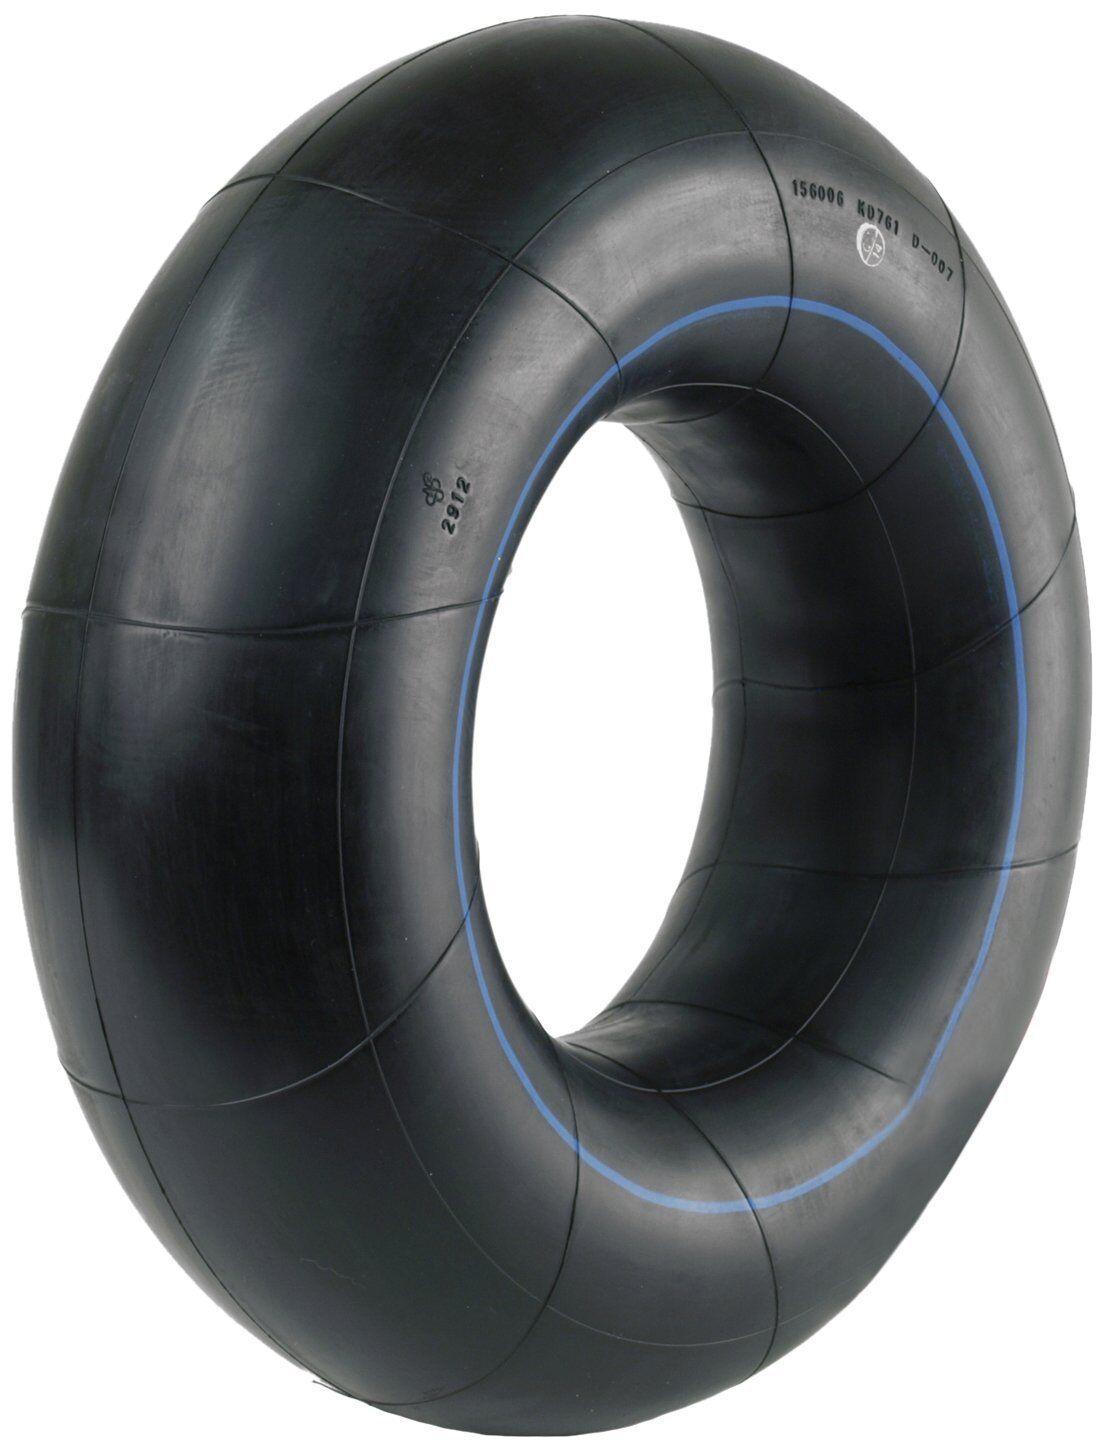 1 WHEELBARROW 6 INCH INNER TUBE 13 X 5.00 400 500 350 410 145 TRAILER TYRE MOWER